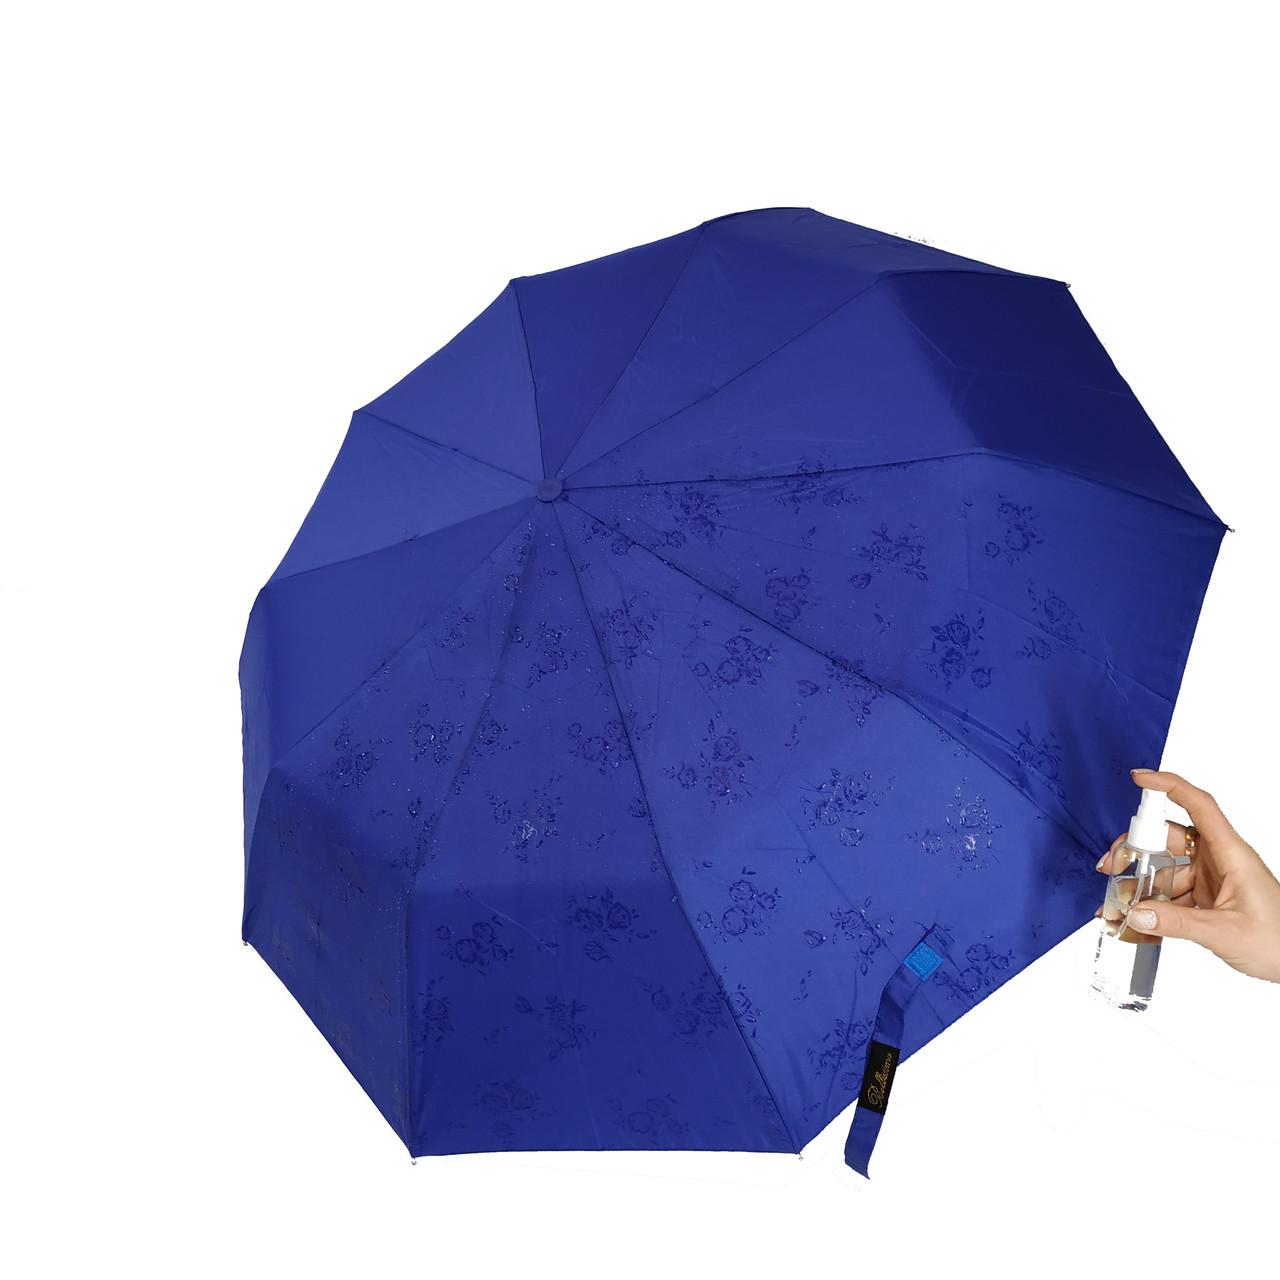 "Женский зонт-полуавтомат на 10 спиц Bellisimo ""Flower land"", проявка,синий цвет, 461-10"